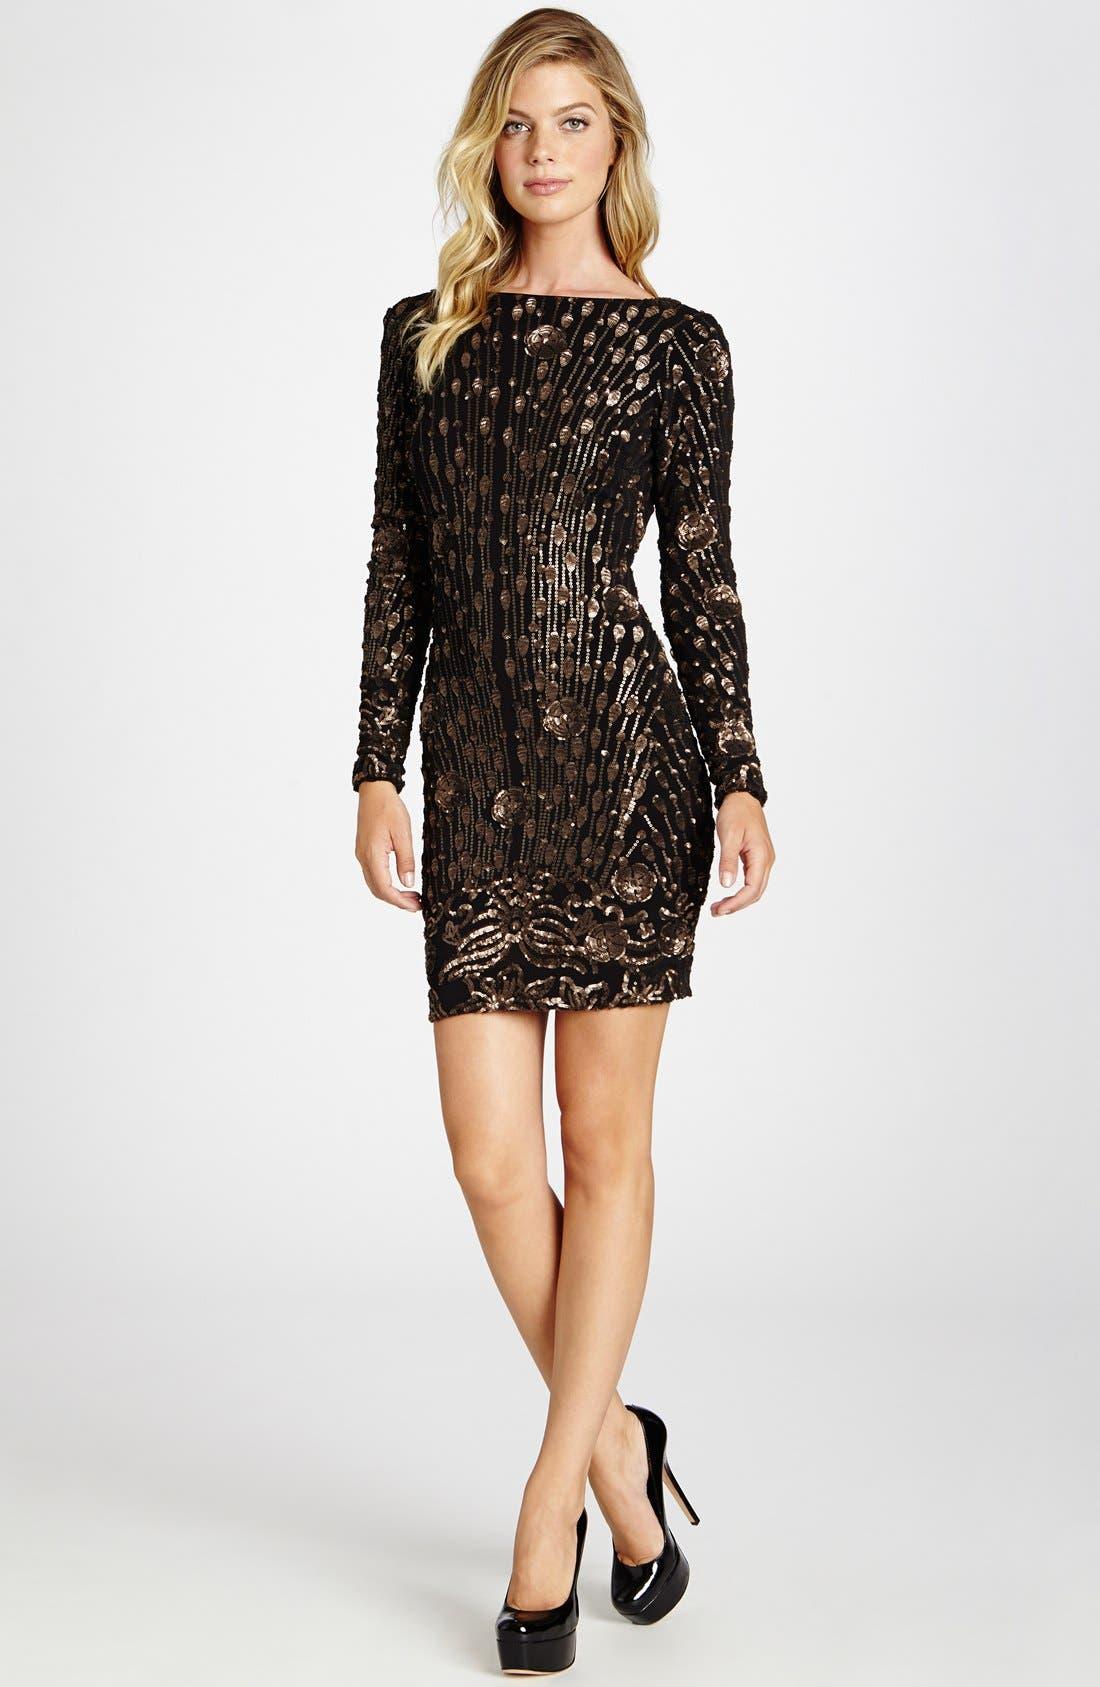 Main Image - Dress the Population 'Lola' Sequin Minidress